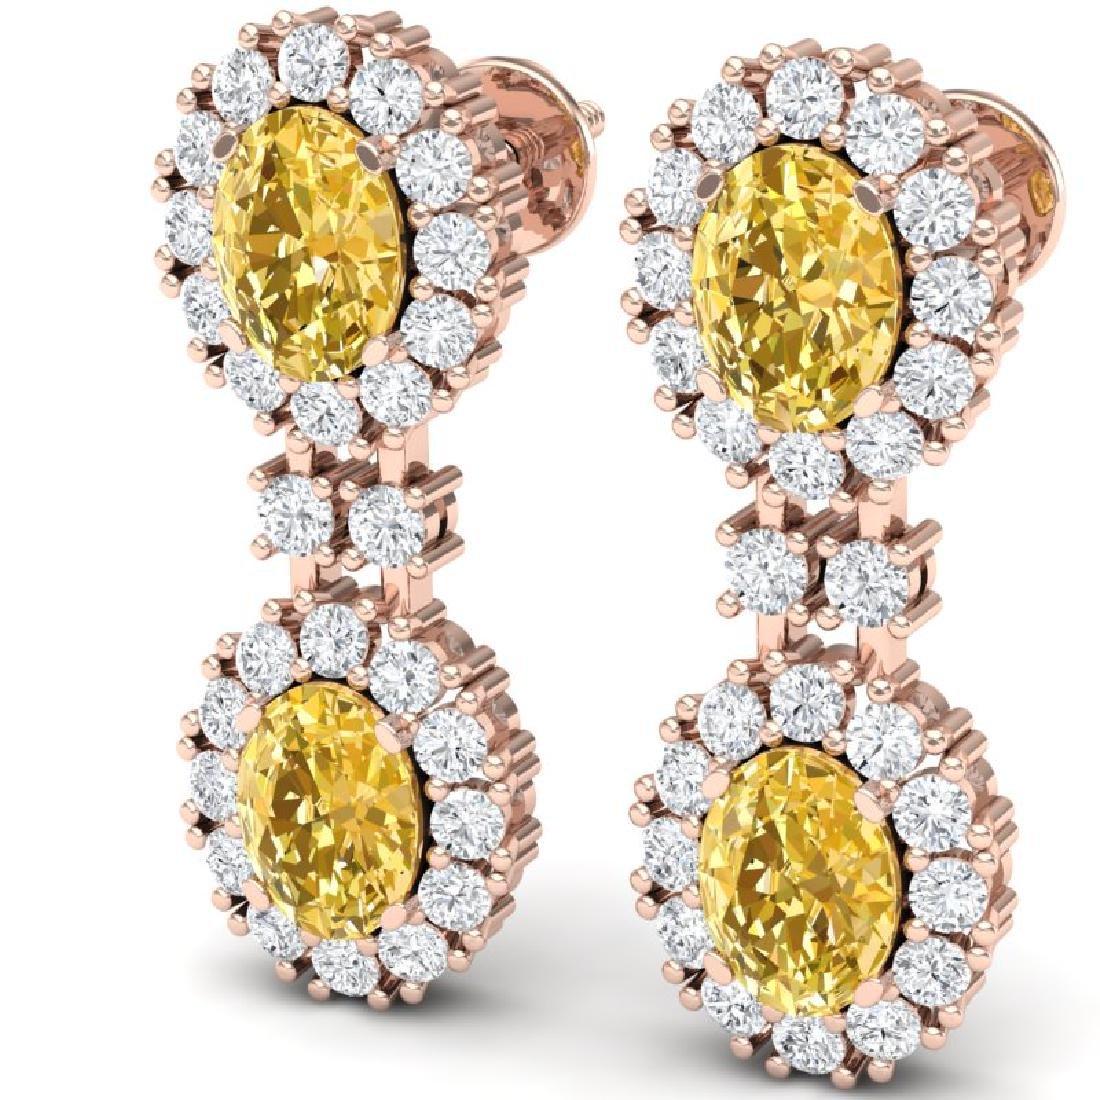 7.8 CTW Royalty Canary Citrine & VS Diamond Earrings - 2